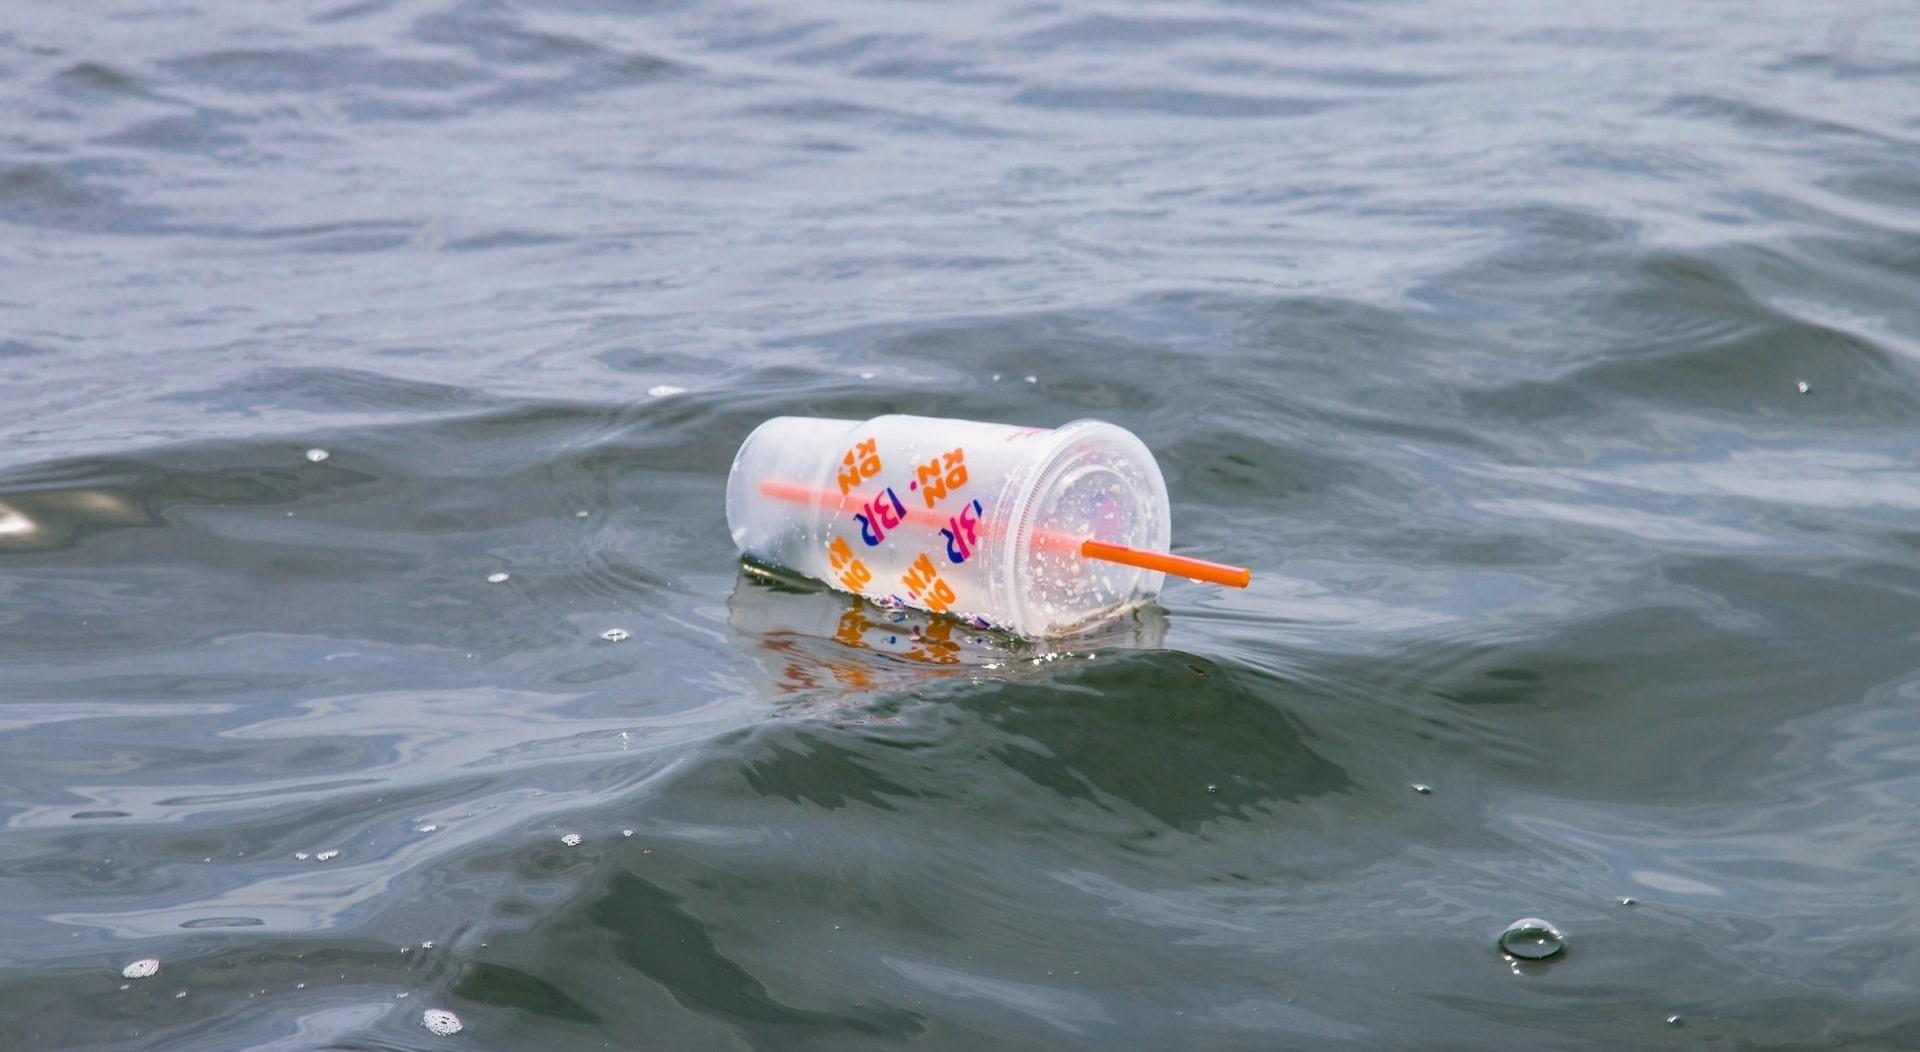 The Inefficacy of Bans on Single-Use Plastics